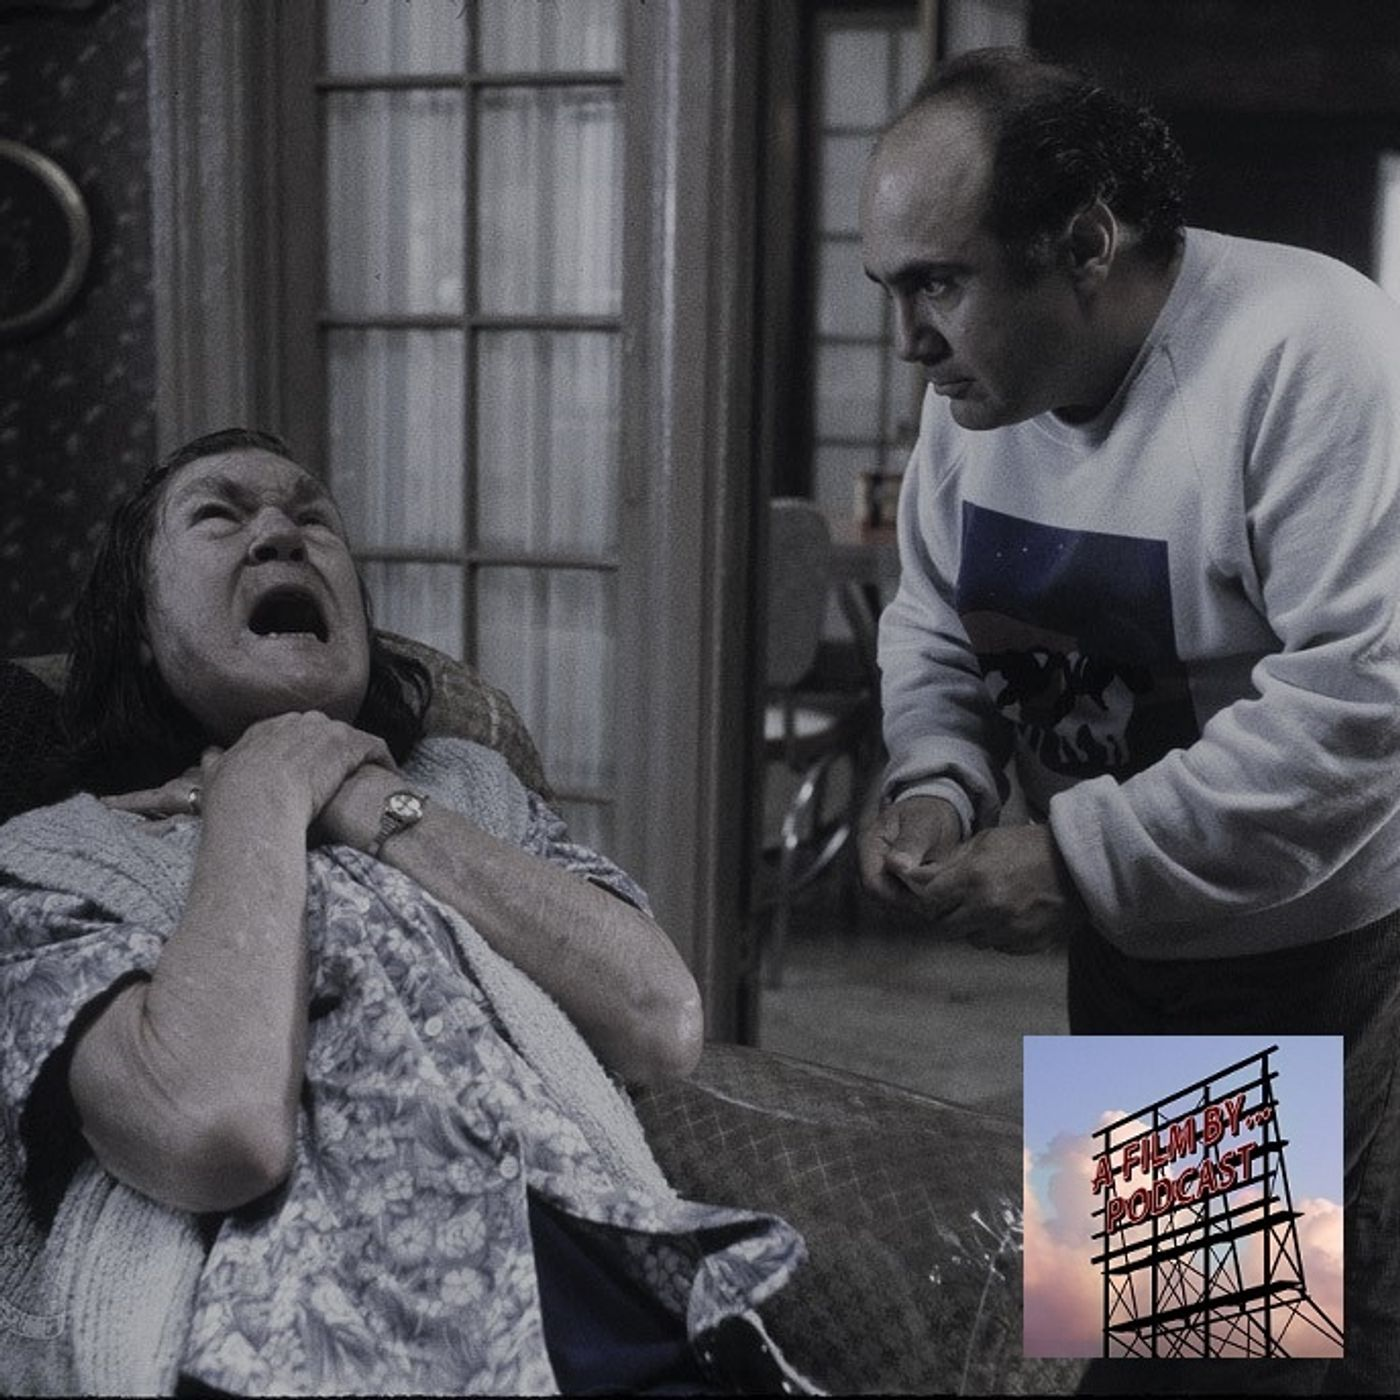 Danny DeVito - Throw Momma From The Train